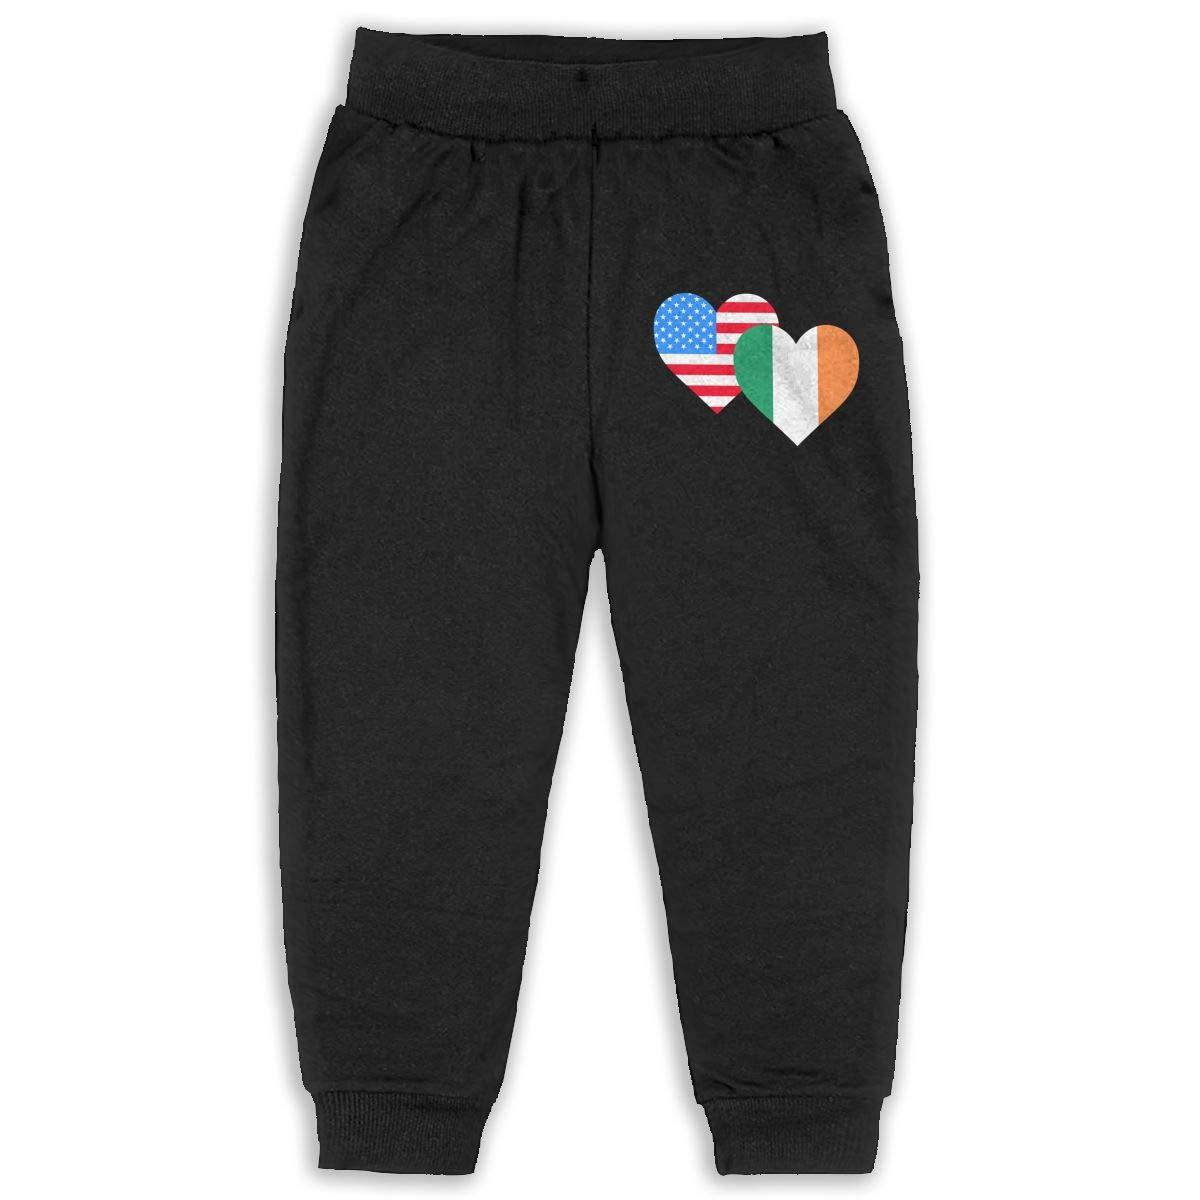 Classic Girls Boys Elastic Trousers American Irish Heart Flag-1 Kids /& Toddler Pants